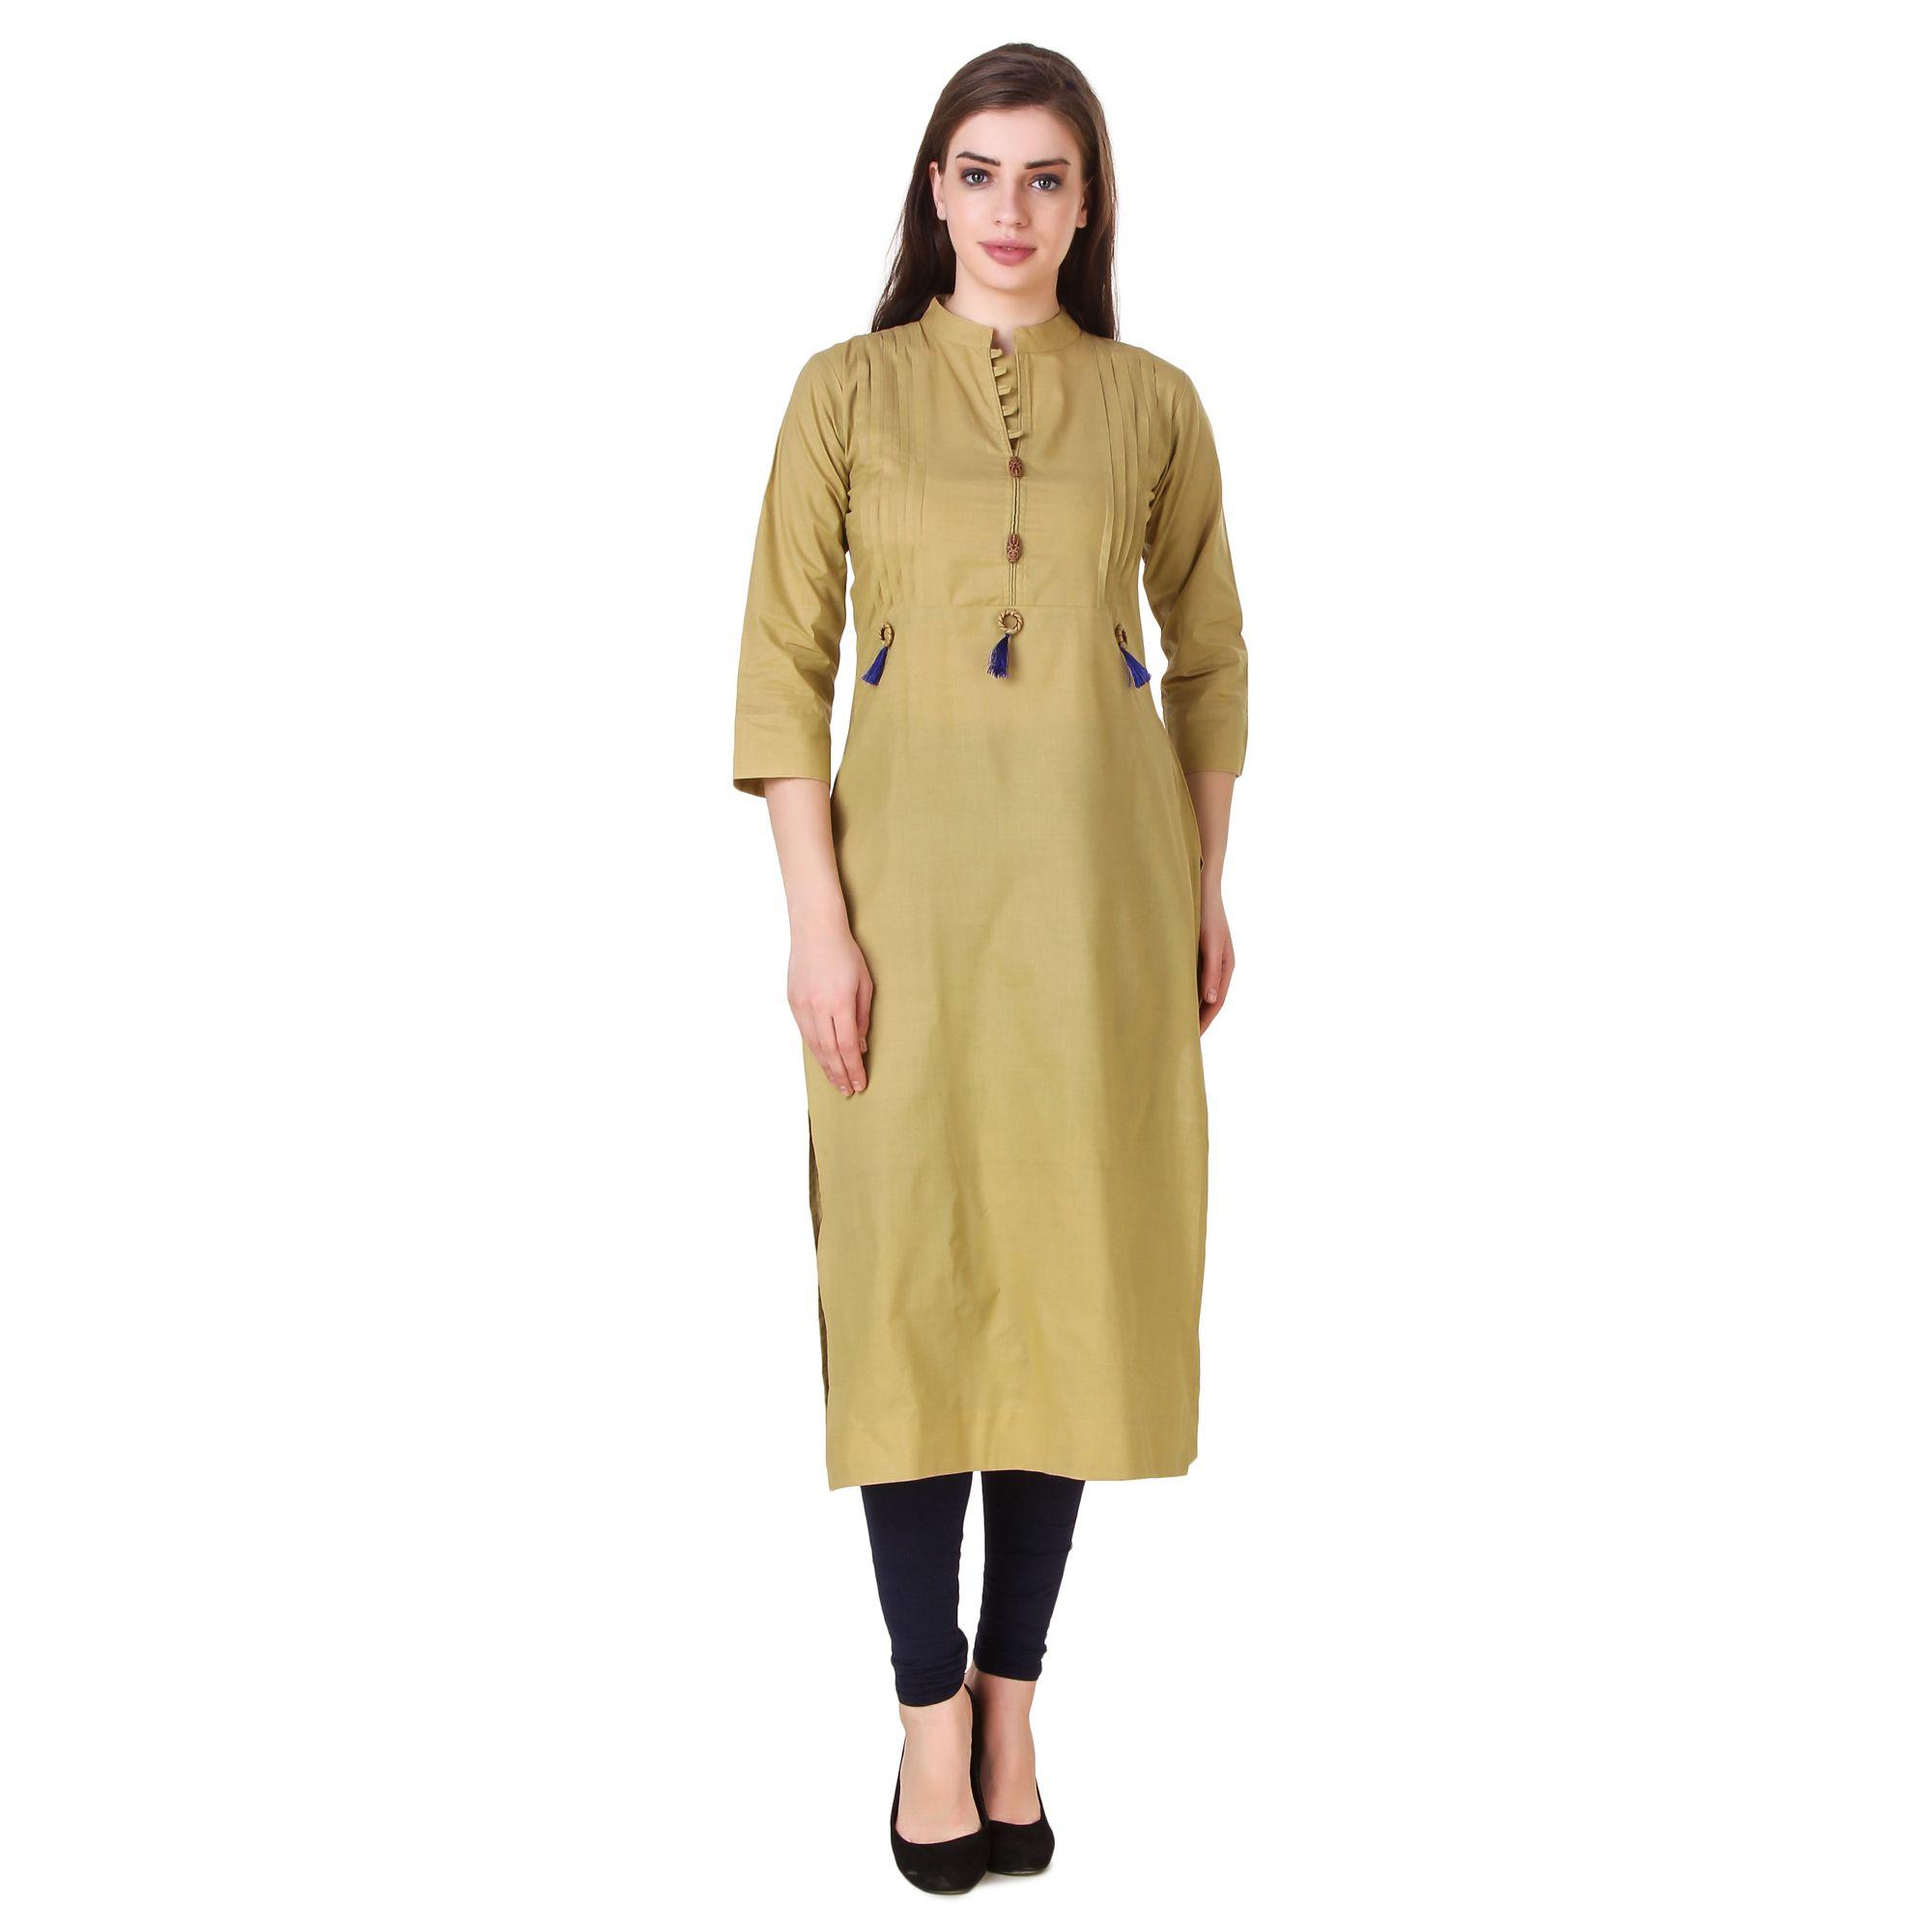 Satva-The Brand Khaki Cotton A-line Kurti